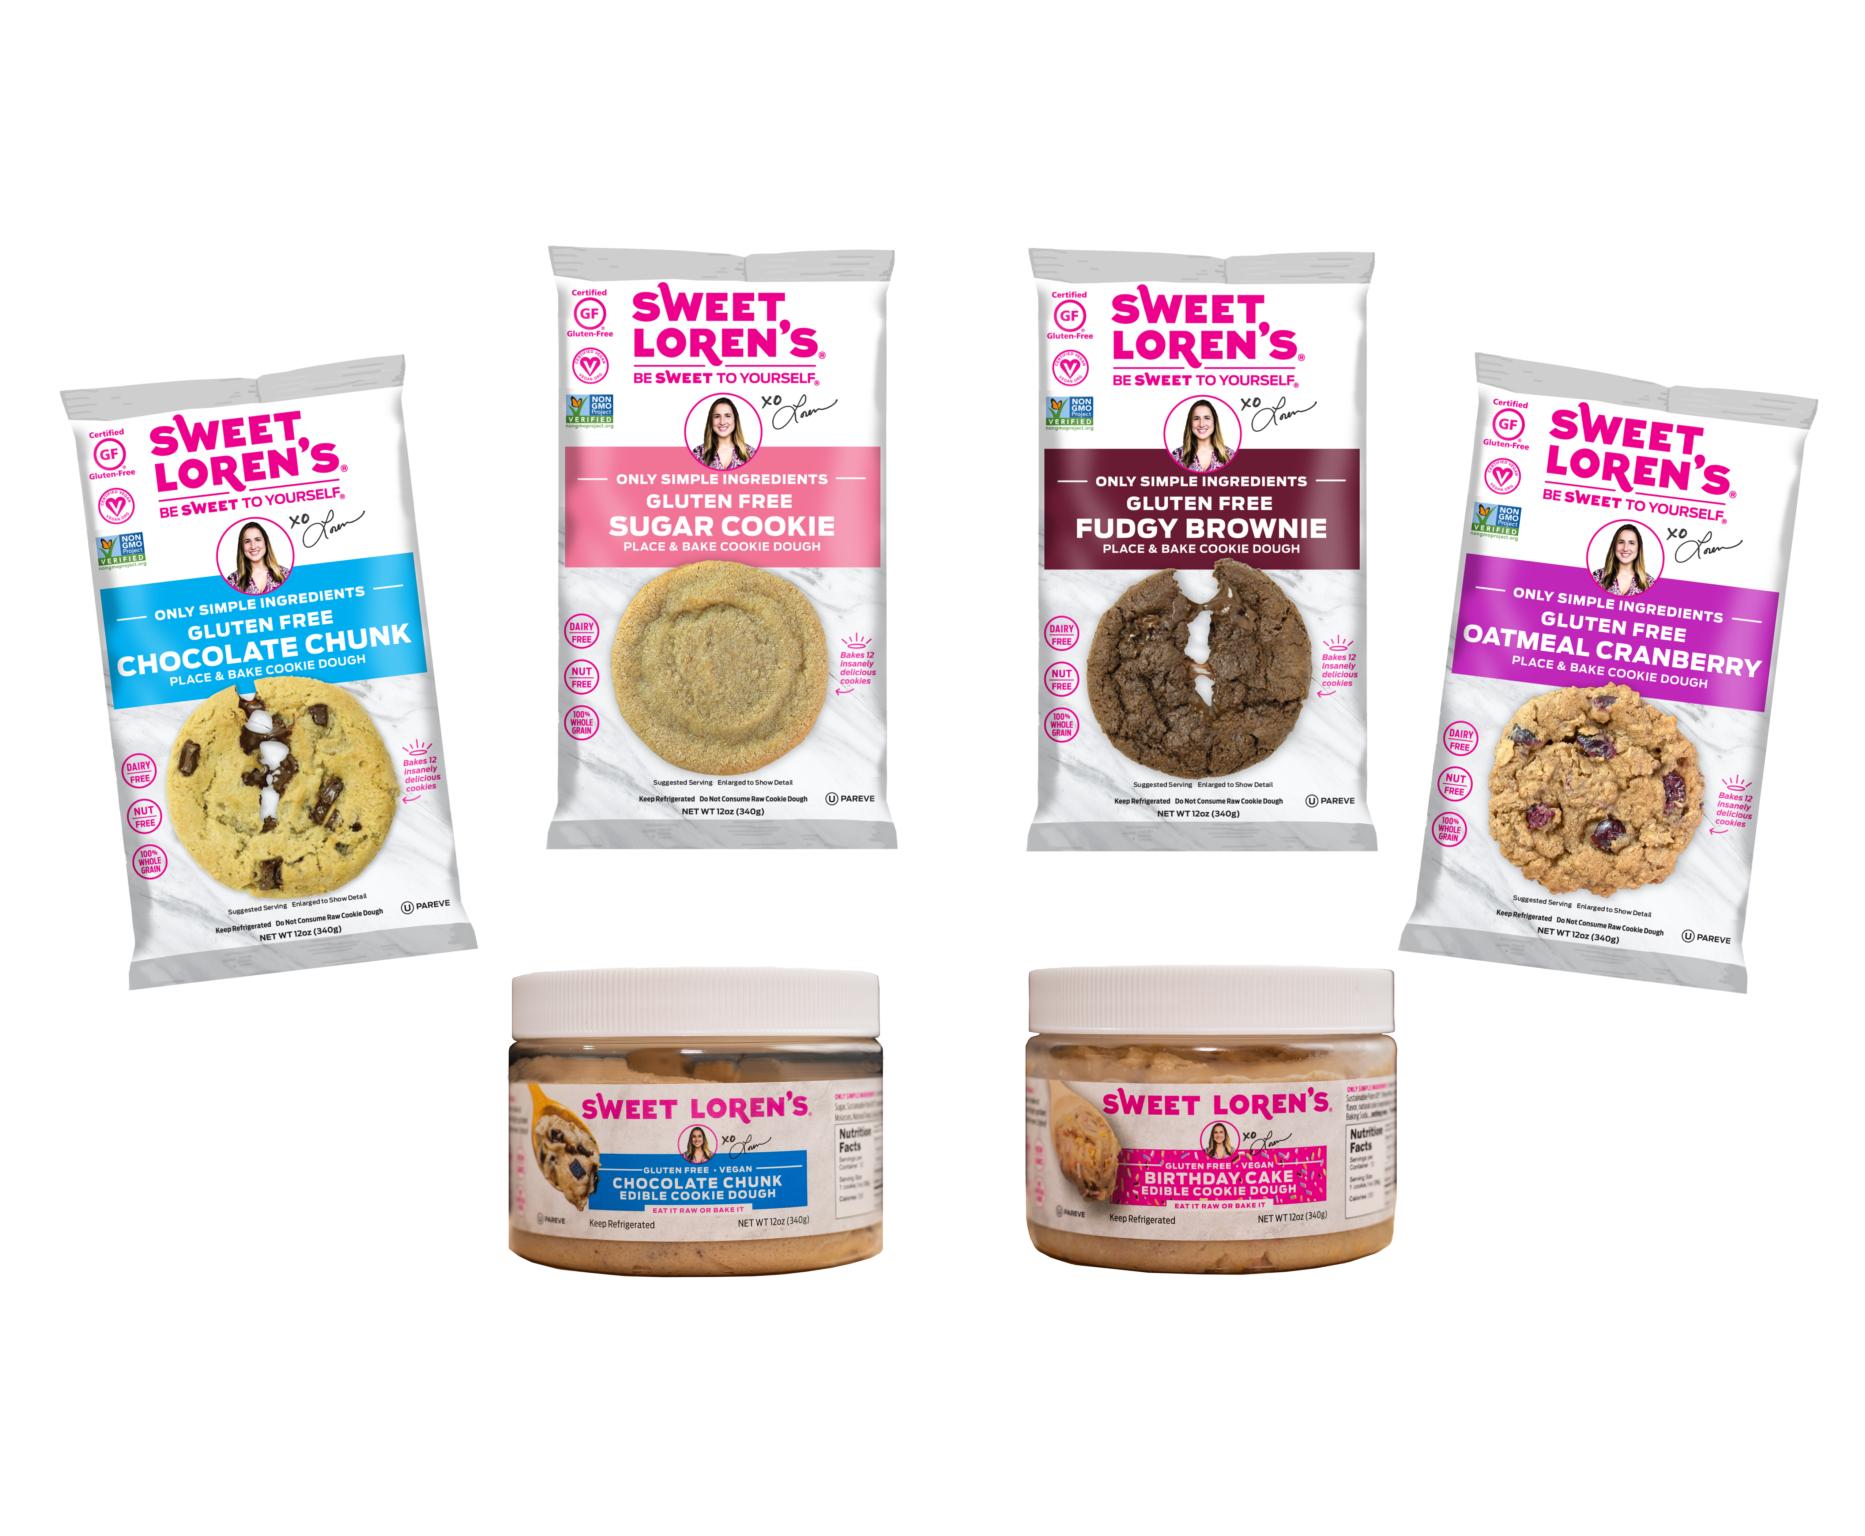 Sweet Loren's Packaging